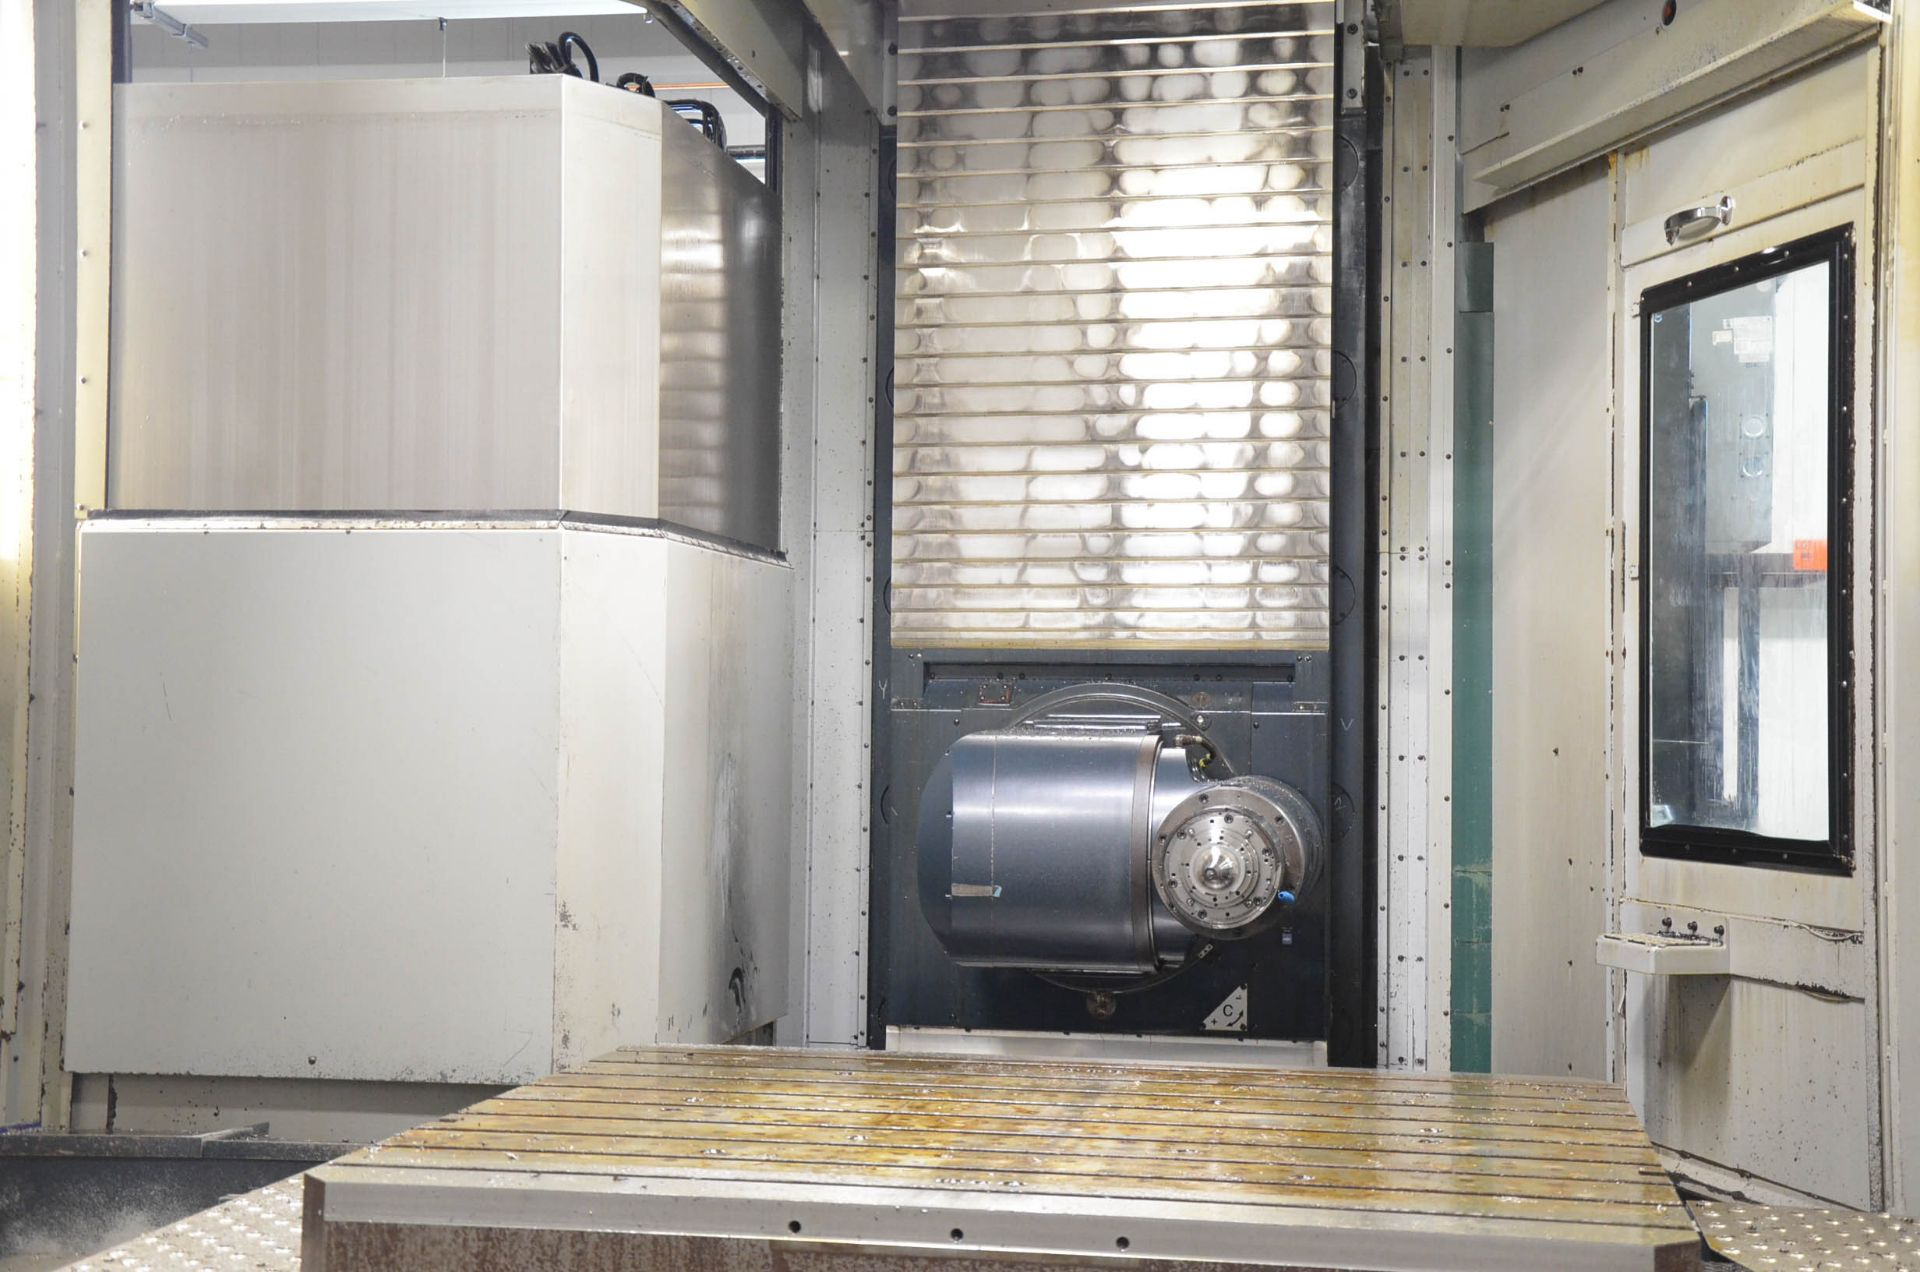 "MAKINO (2013) MCC2013 VG 6-AXIS CNC MACHINING CENTER WITH MAKINO PROFESSIONAL 5 CNC CONTROL, 59"" X - Image 7 of 11"